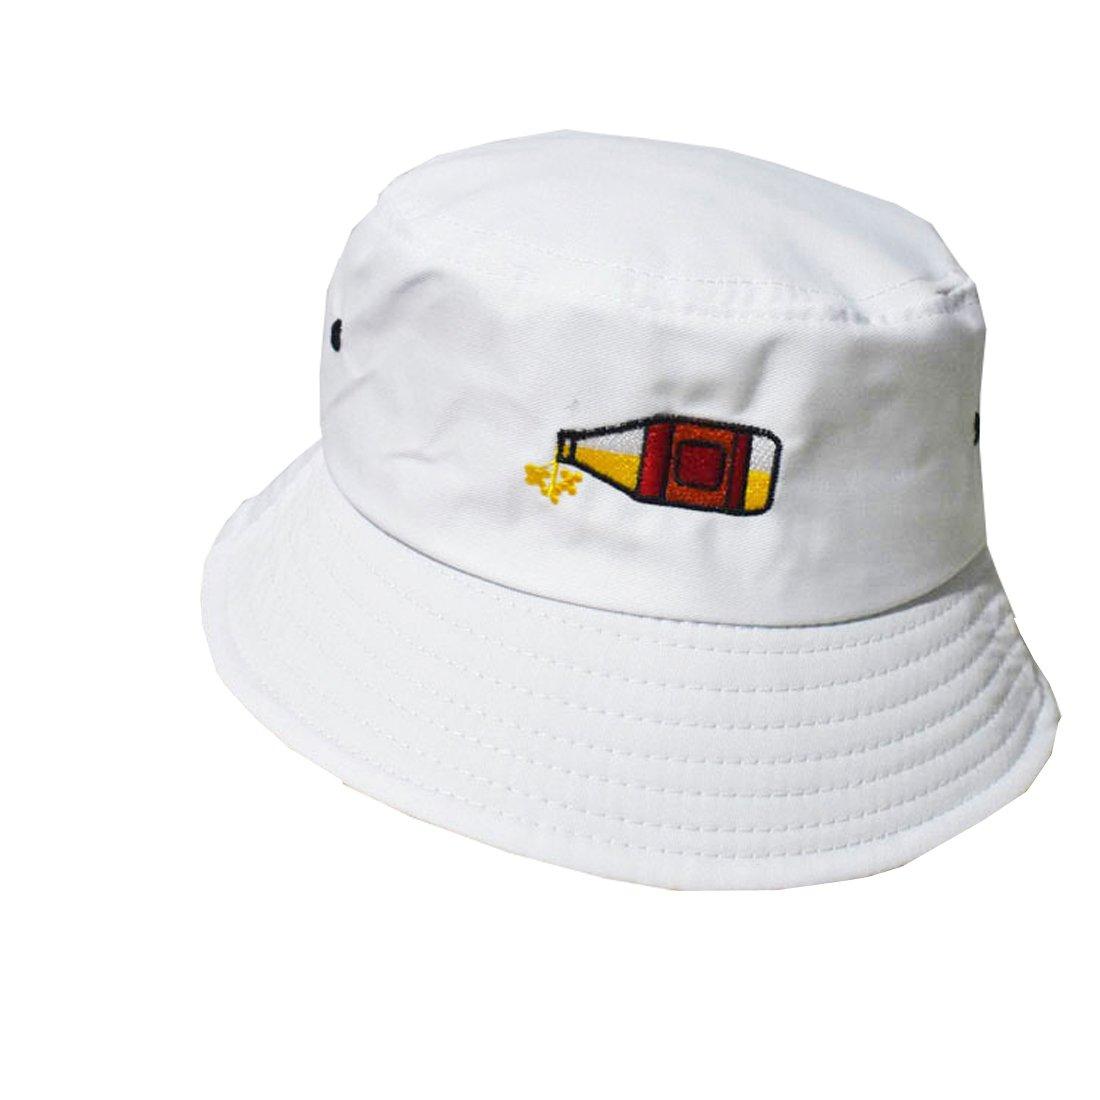 YueLian Mens Womens Summer Outdoor Cotton Plain Printed Flat Bucket Hats